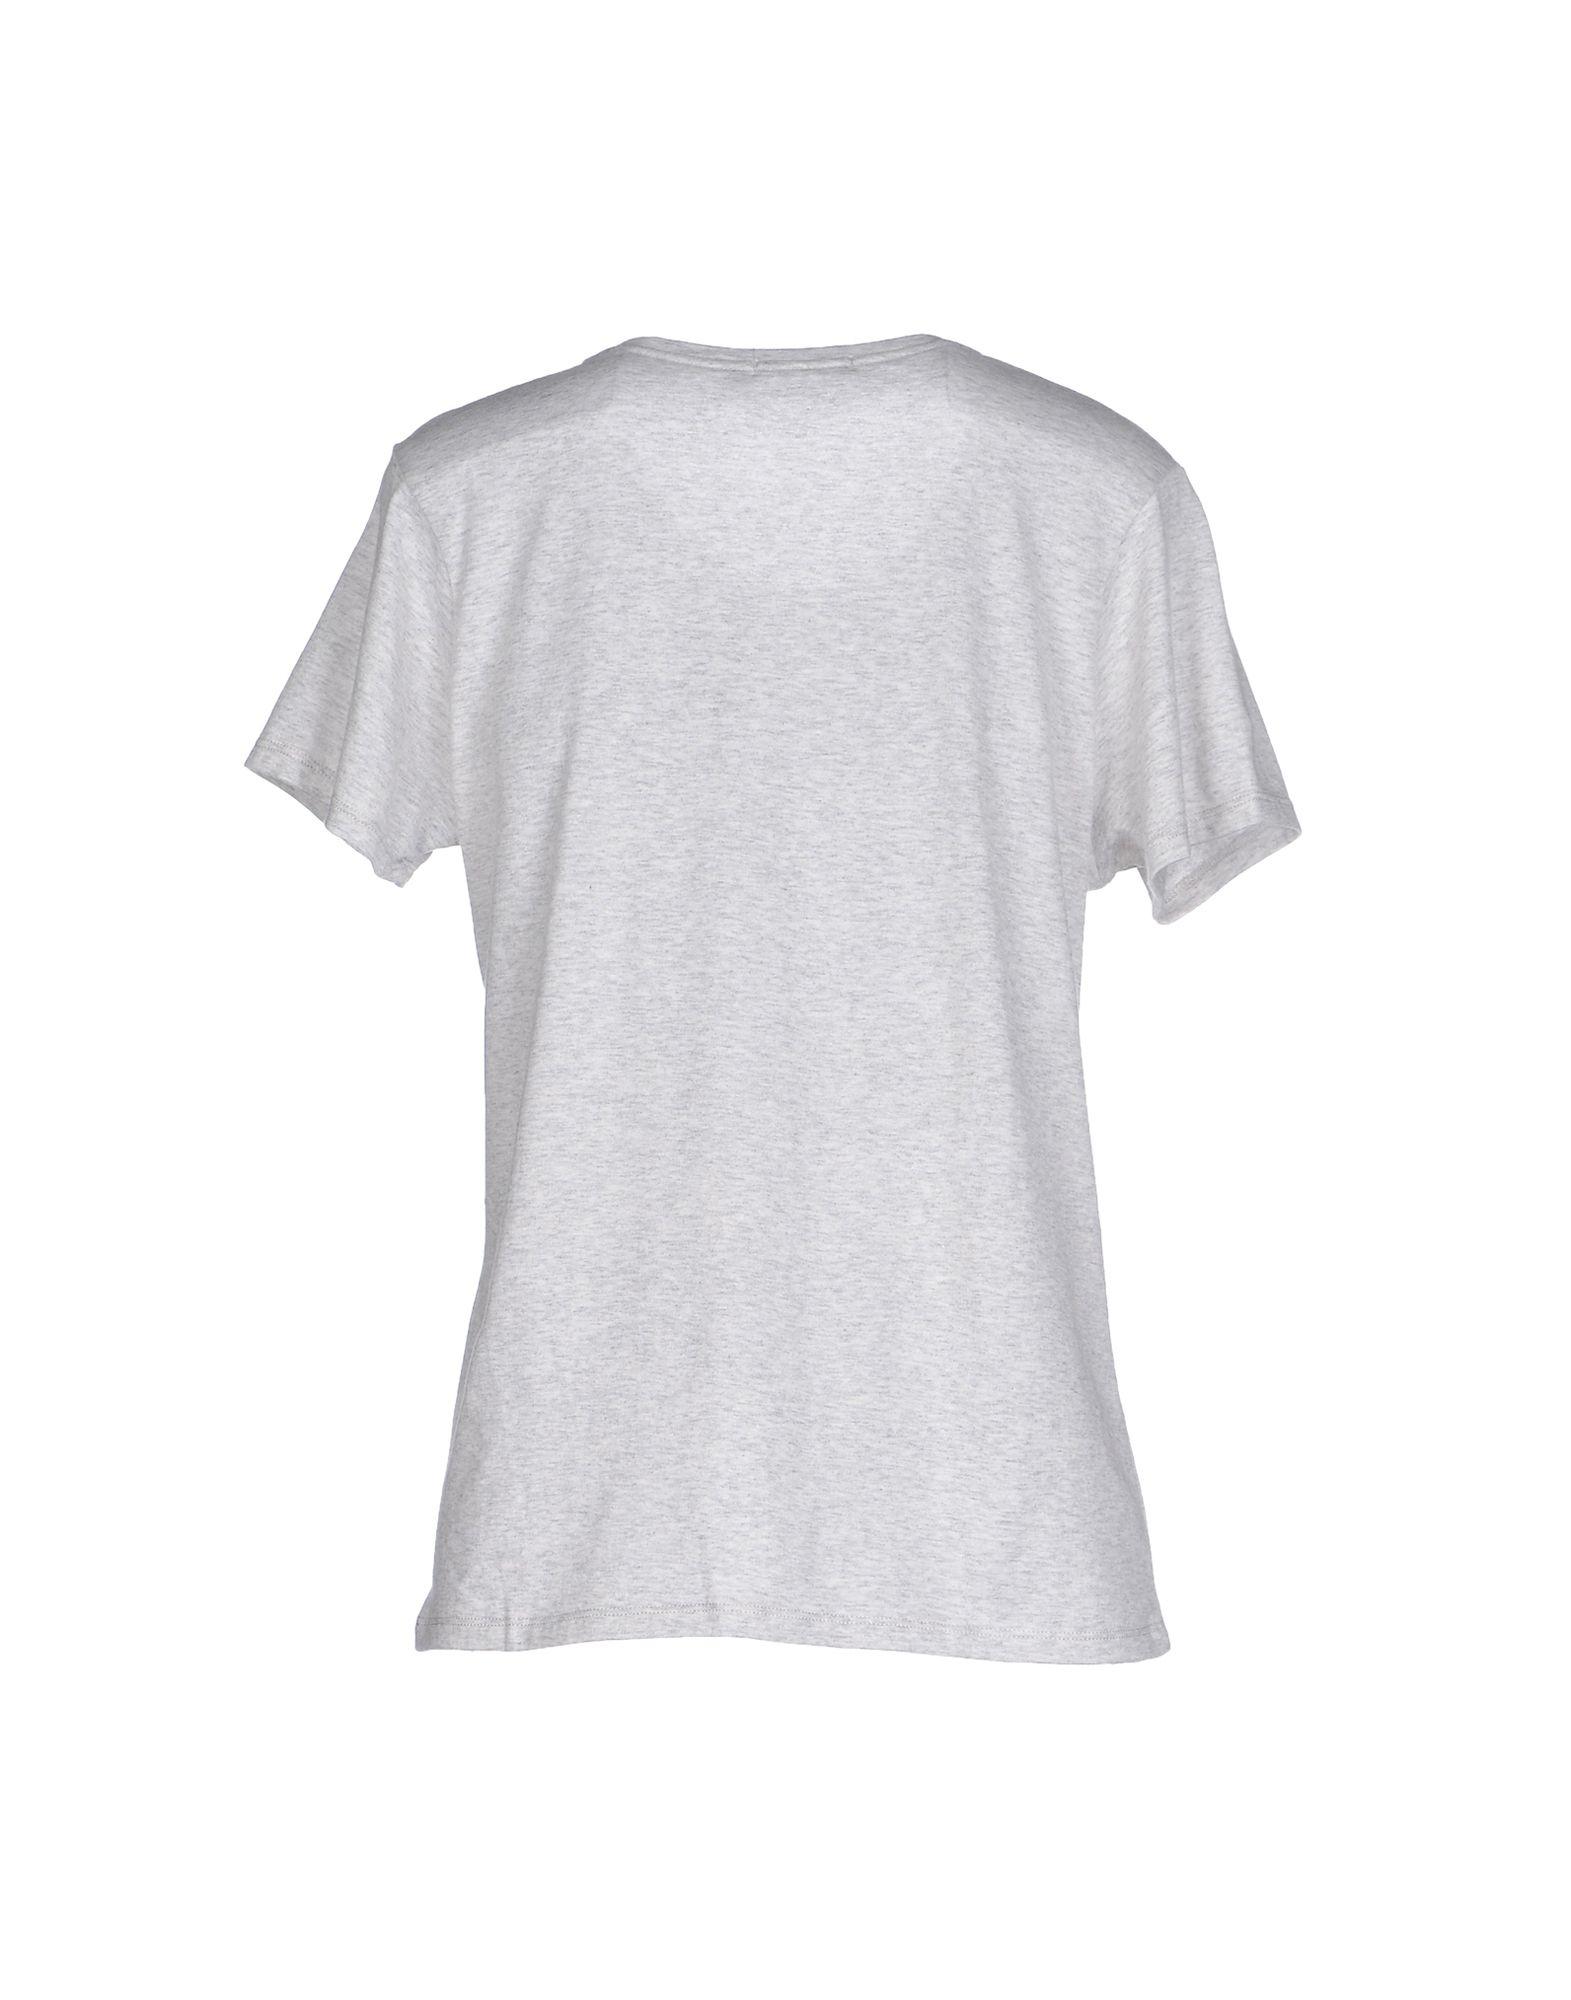 petit bateau t shirt in white for men lyst. Black Bedroom Furniture Sets. Home Design Ideas